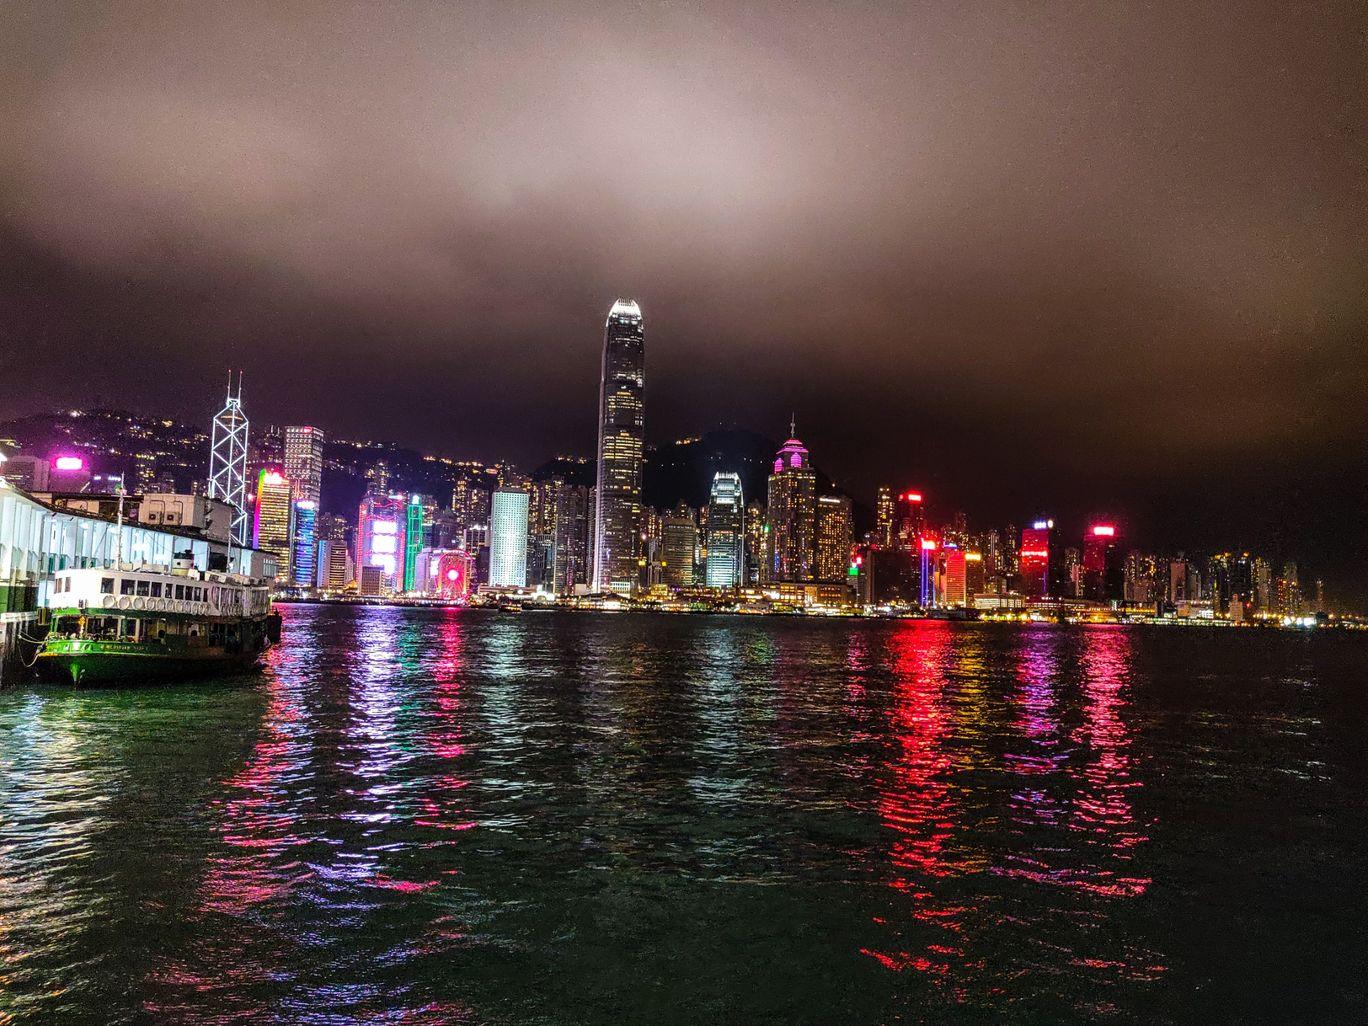 Photo of Victoria Harbour By Prerna Gaur